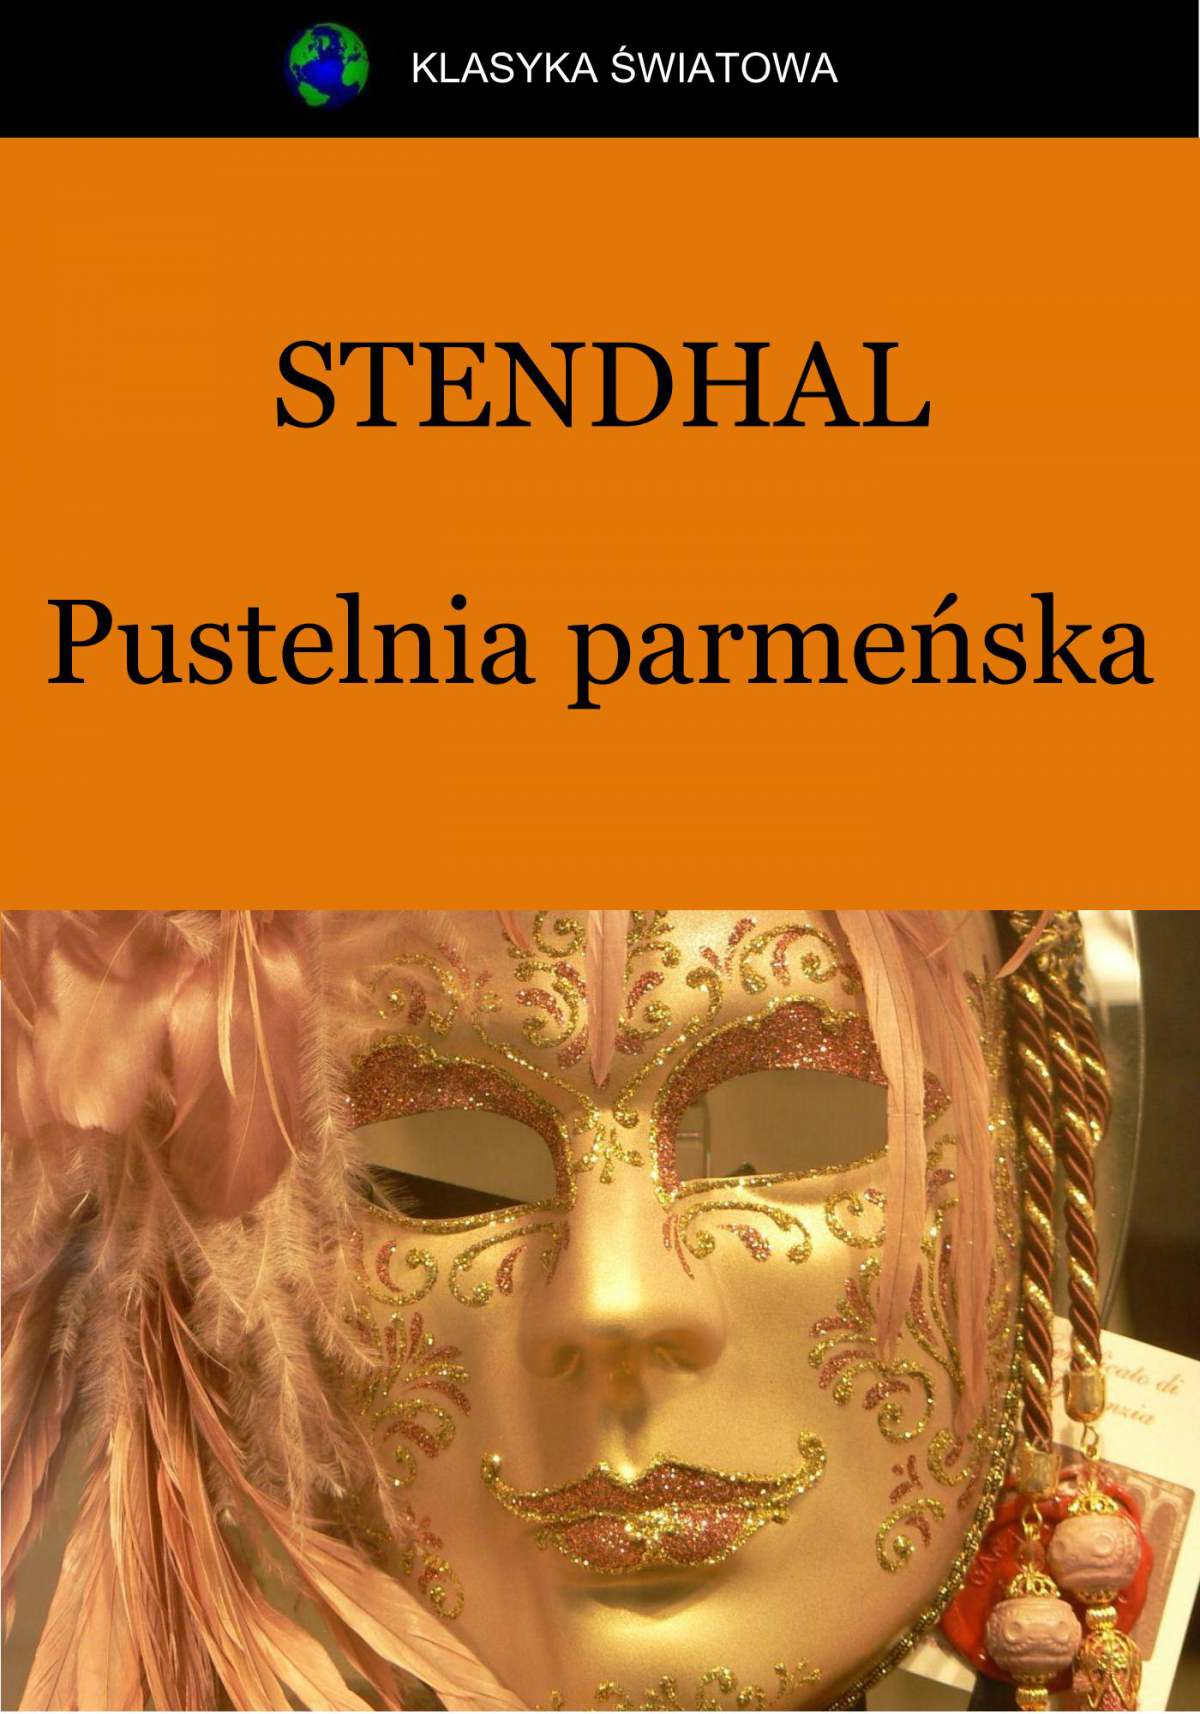 Pustelnia parmeńska - Ebook (Książka EPUB) do pobrania w formacie EPUB